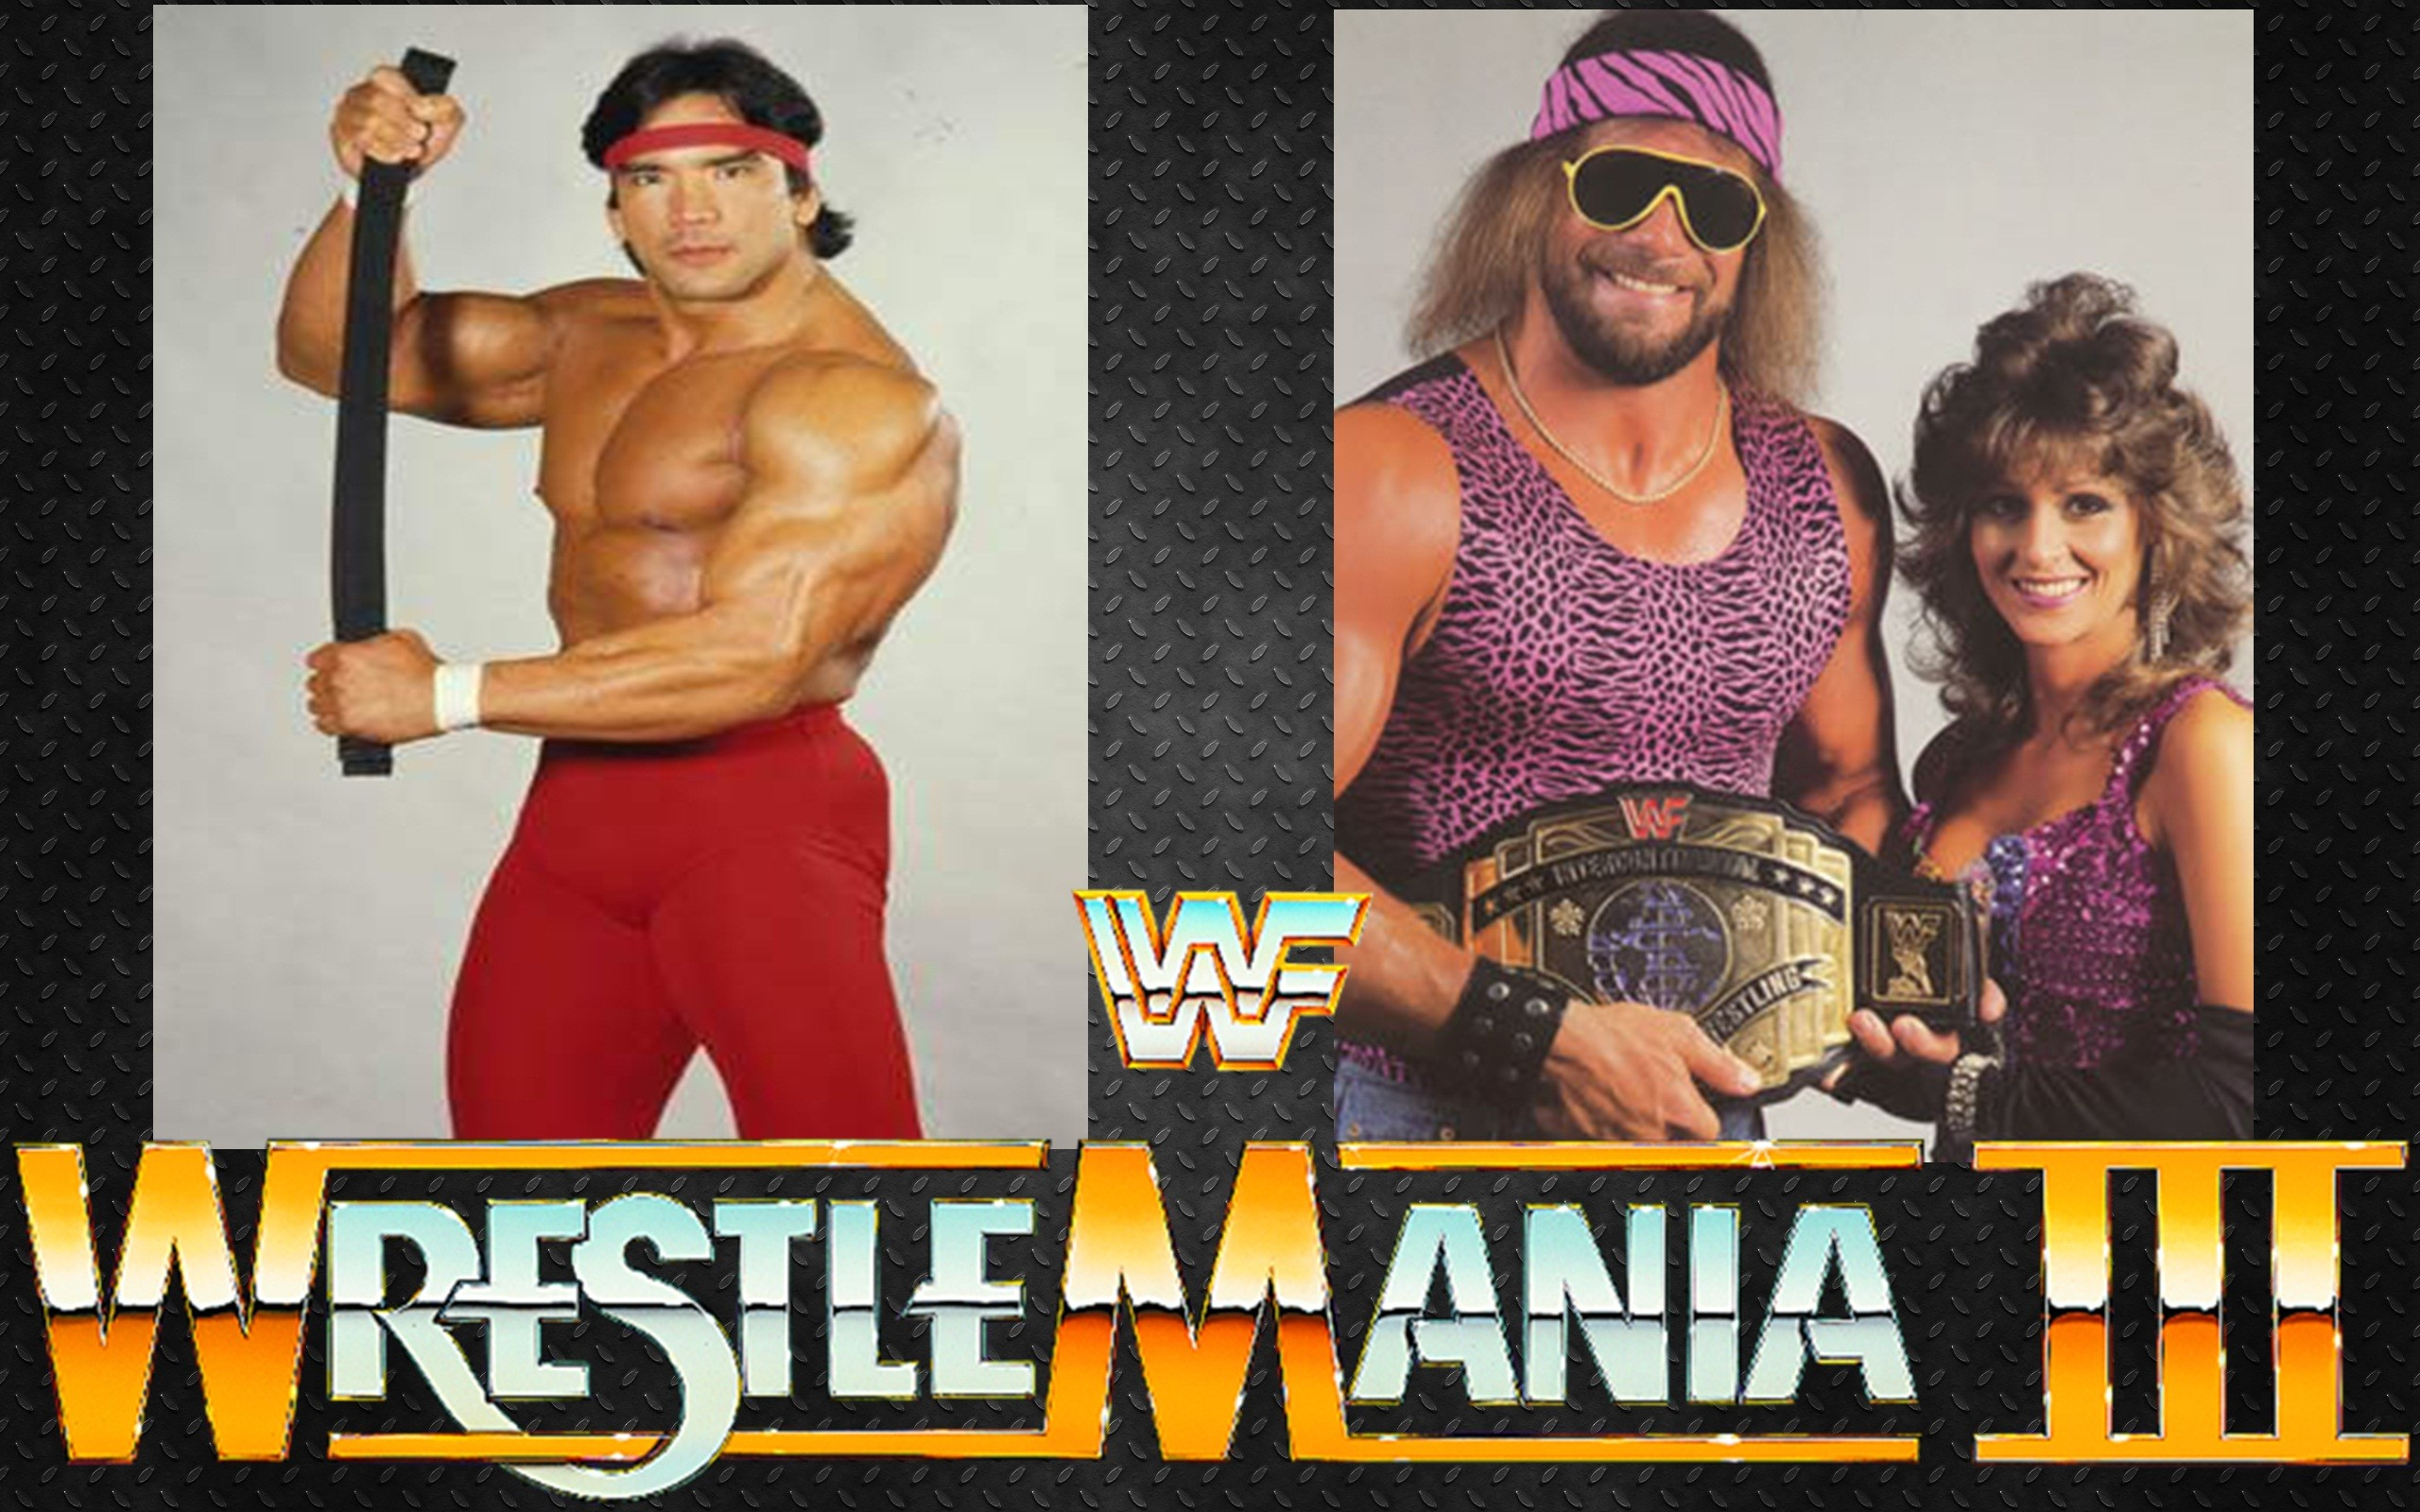 WrestleMania Rewind: Randy Savage vs. Ricky Steamboat at WrestleMania III –  Slide 1 of 3